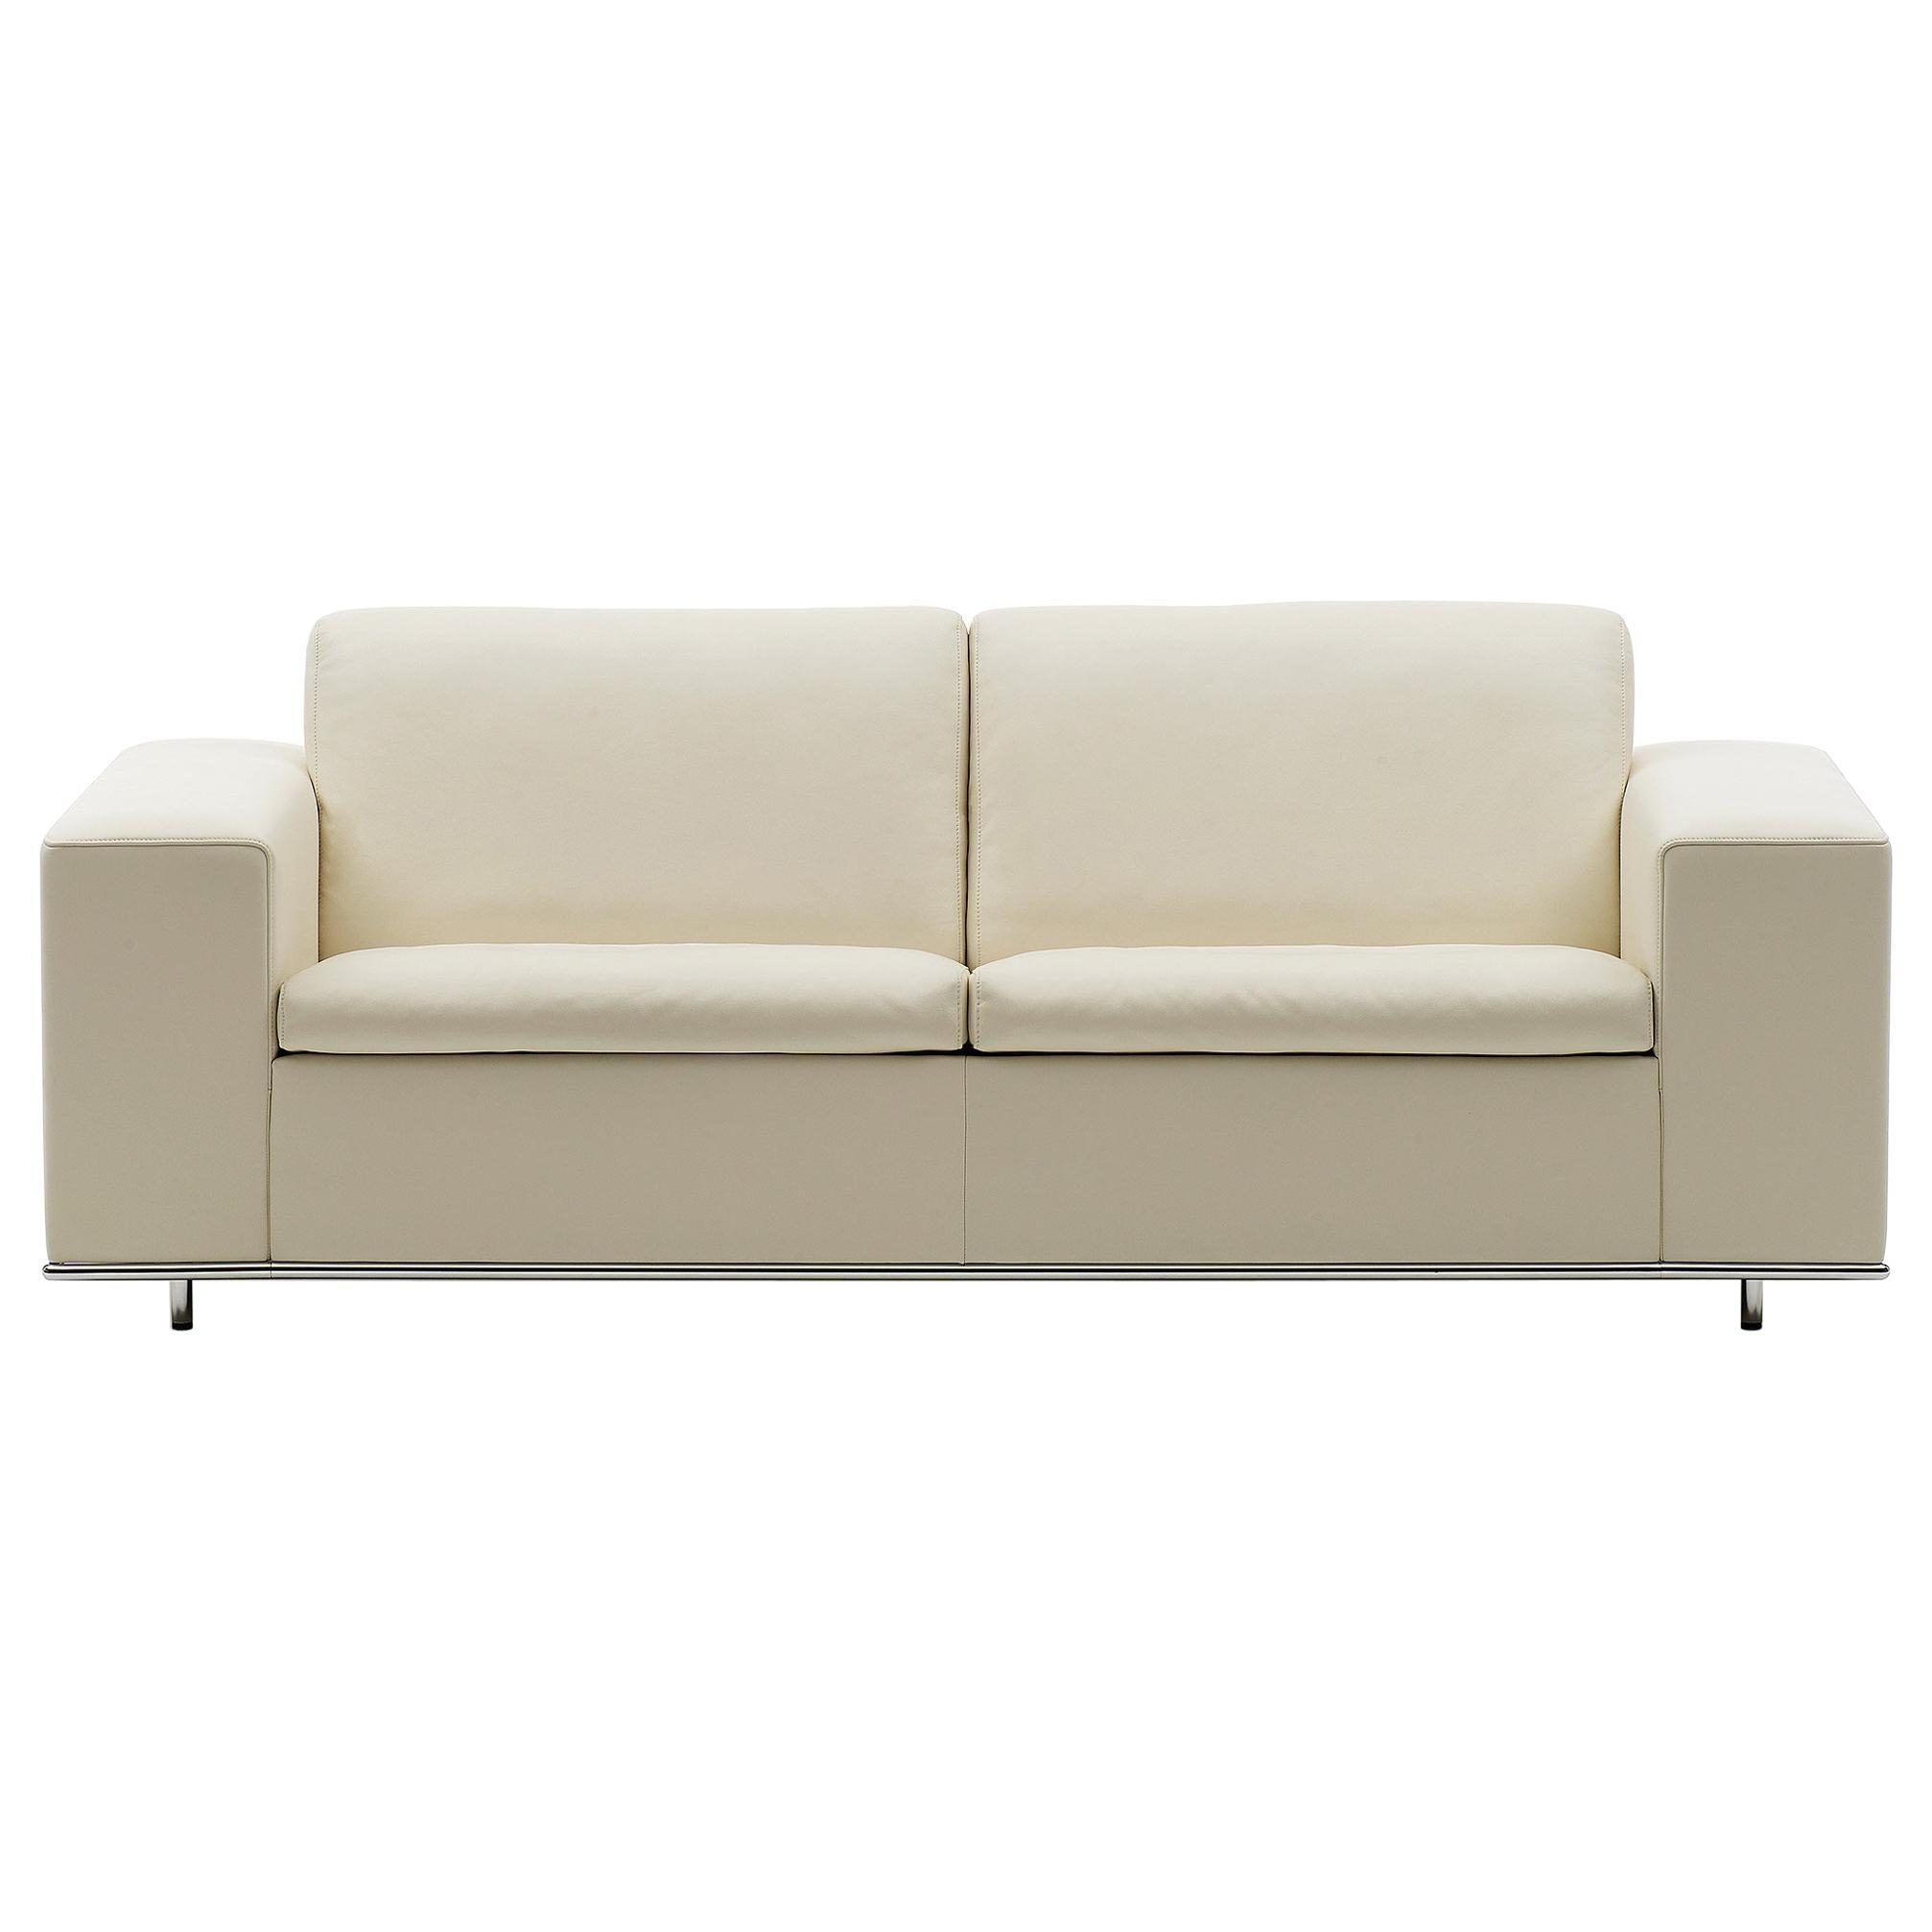 De Sede DS-3 Two-Seat Sofa in Beige Upholstery by Antonella Scarpitta